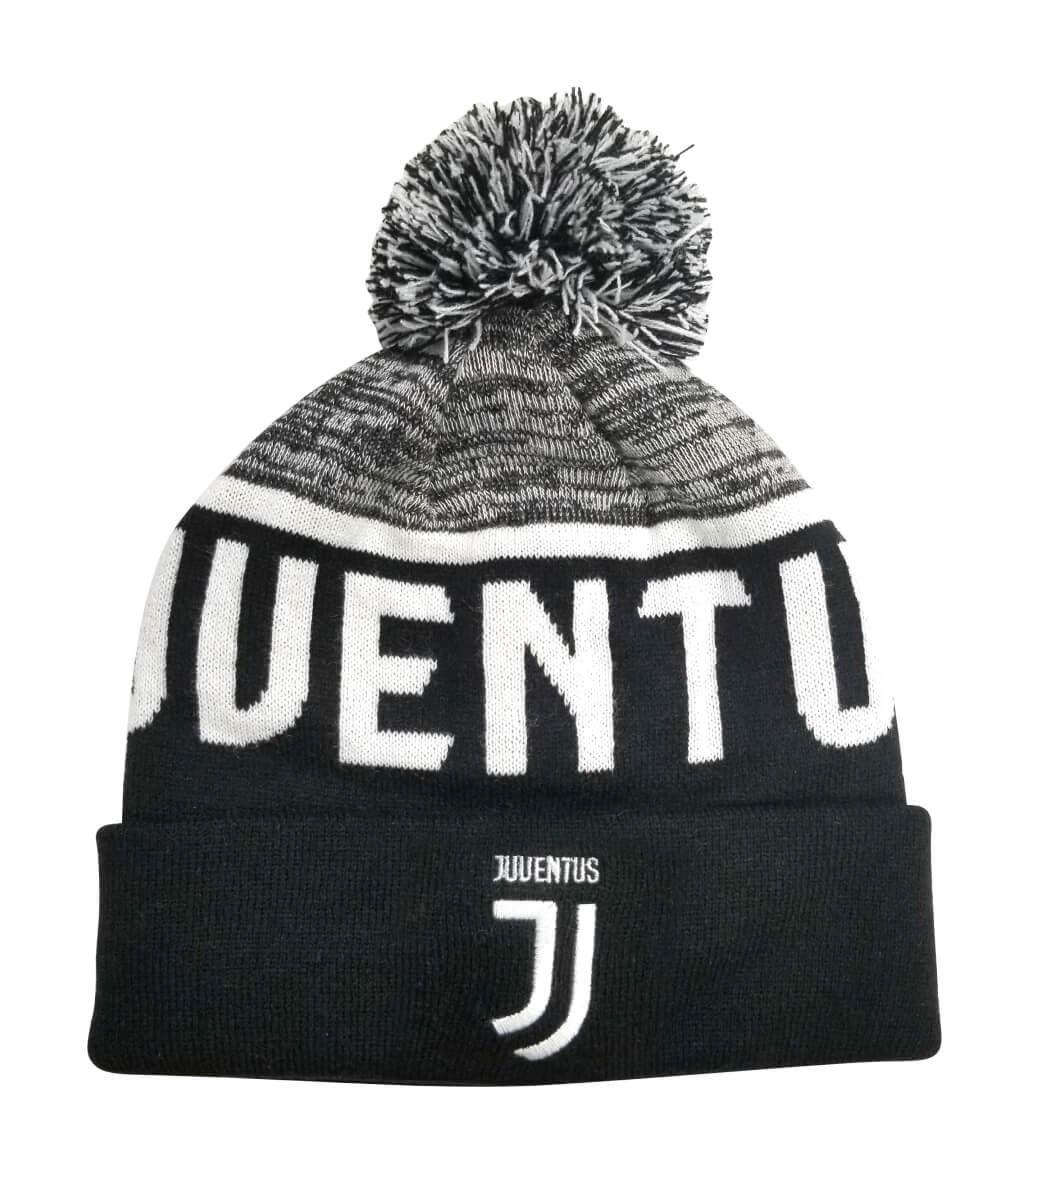 Juventus Pom Beanie - Black